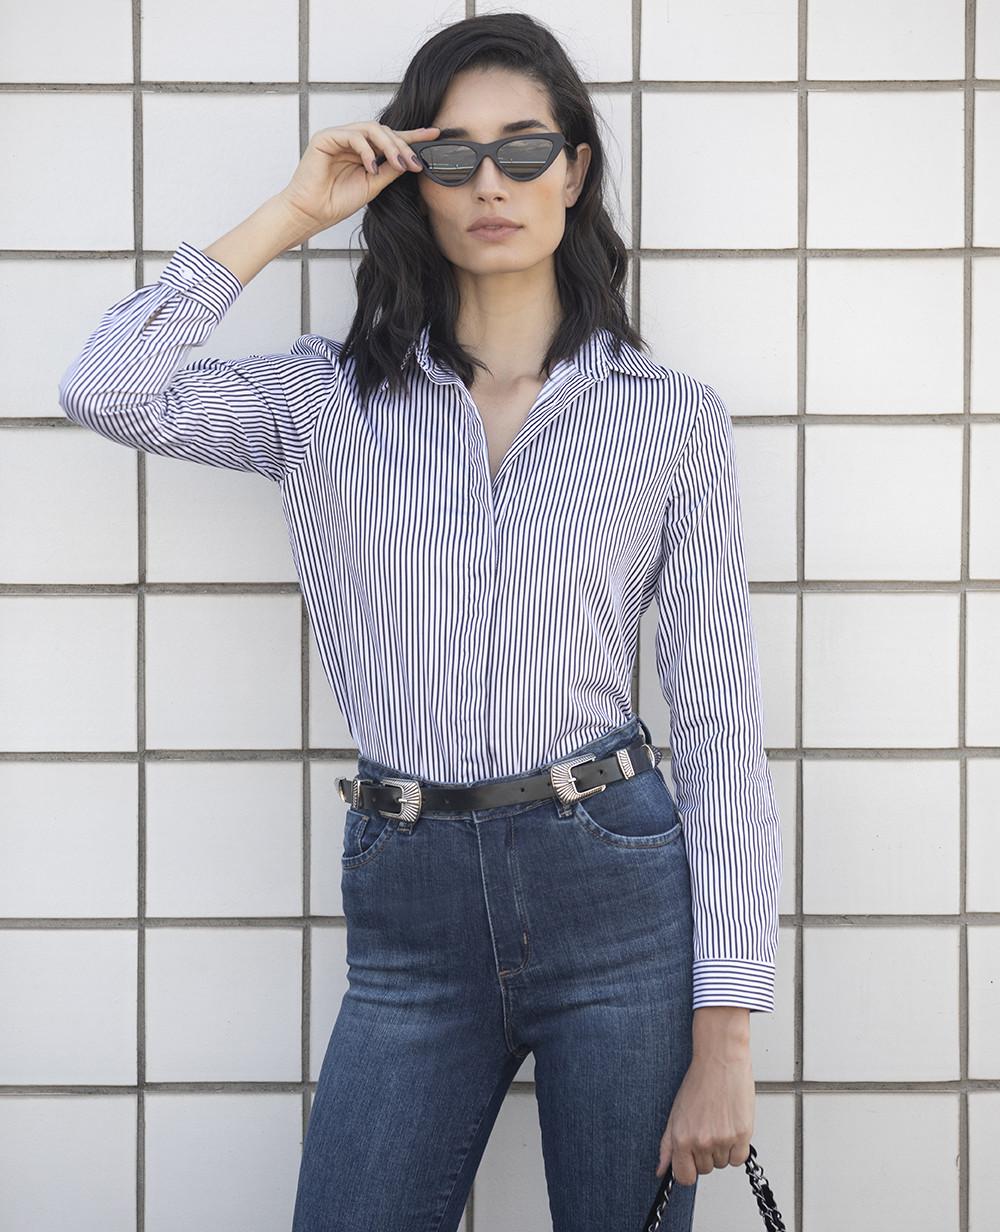 70d4ff622 Moda Feminina Online  Roupas